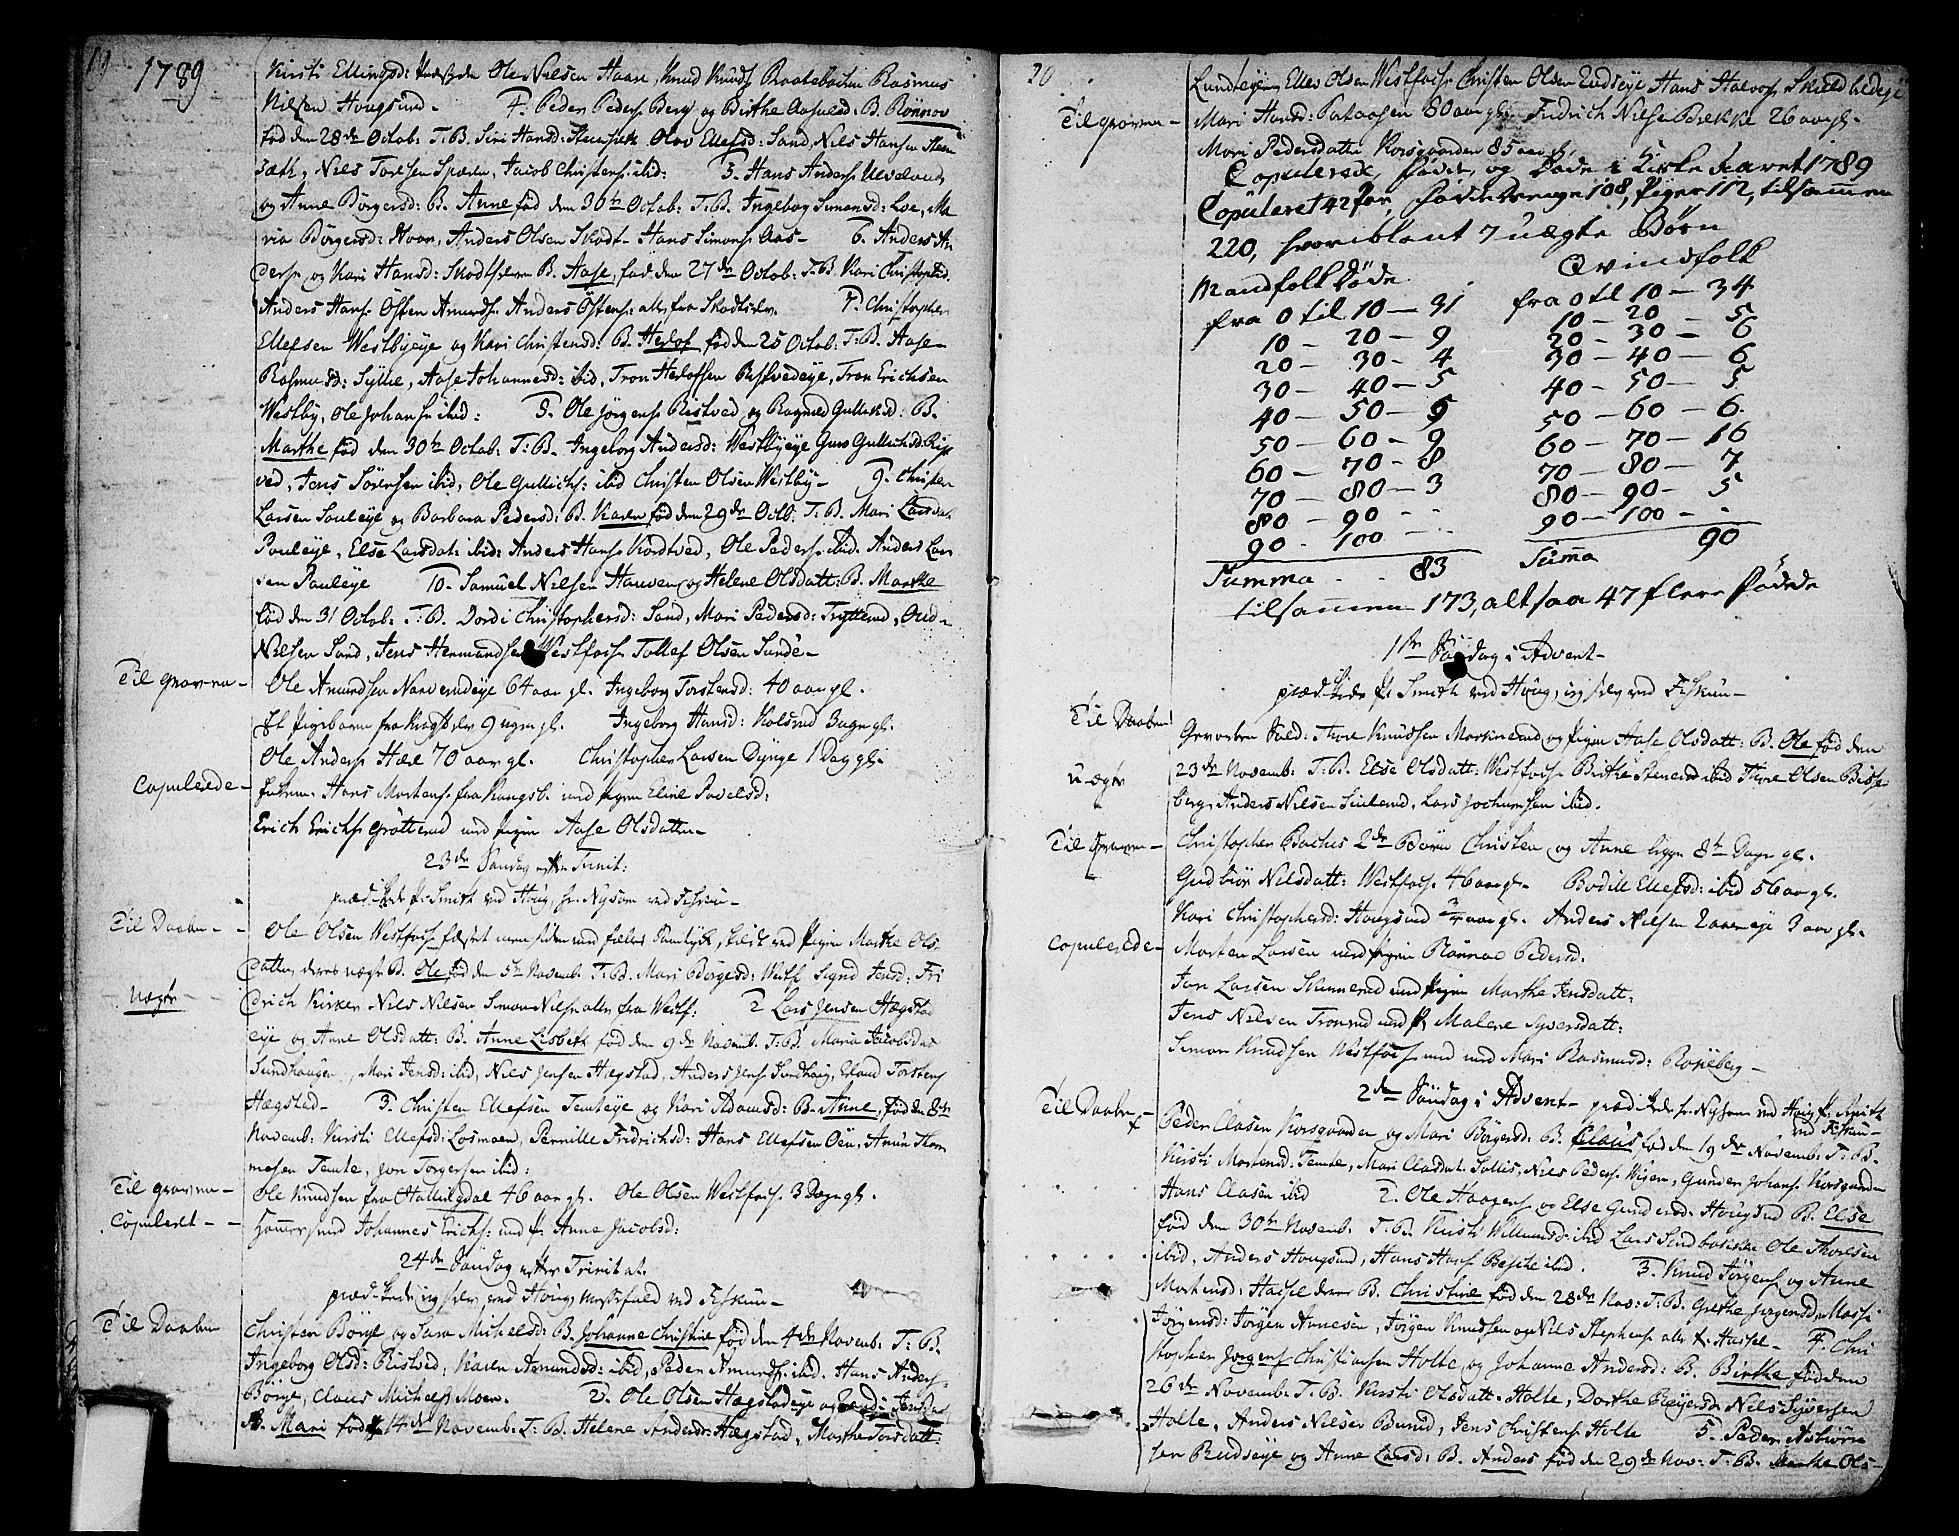 SAKO, Eiker kirkebøker, F/Fa/L0009: Ministerialbok nr. I 9, 1789-1806, s. 19-20